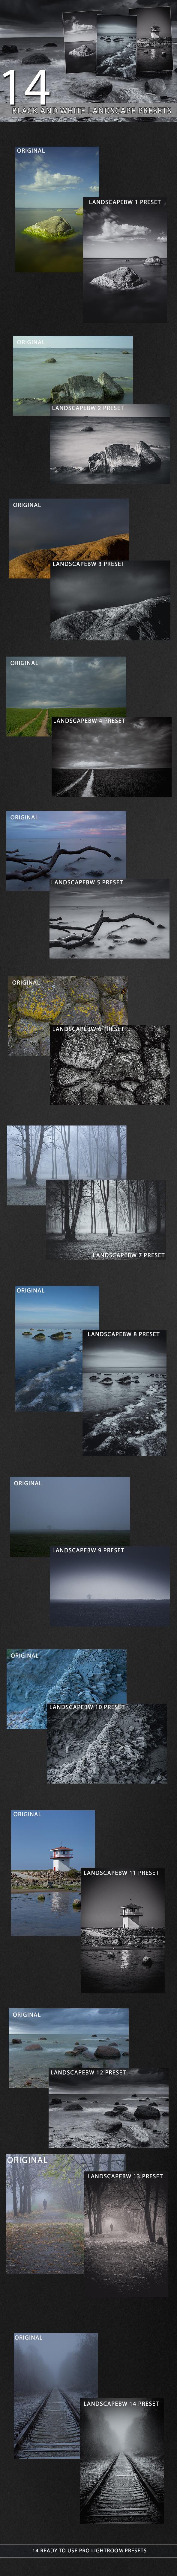 14 Black and White Landscape Presets - Black and white Lightroom Presets